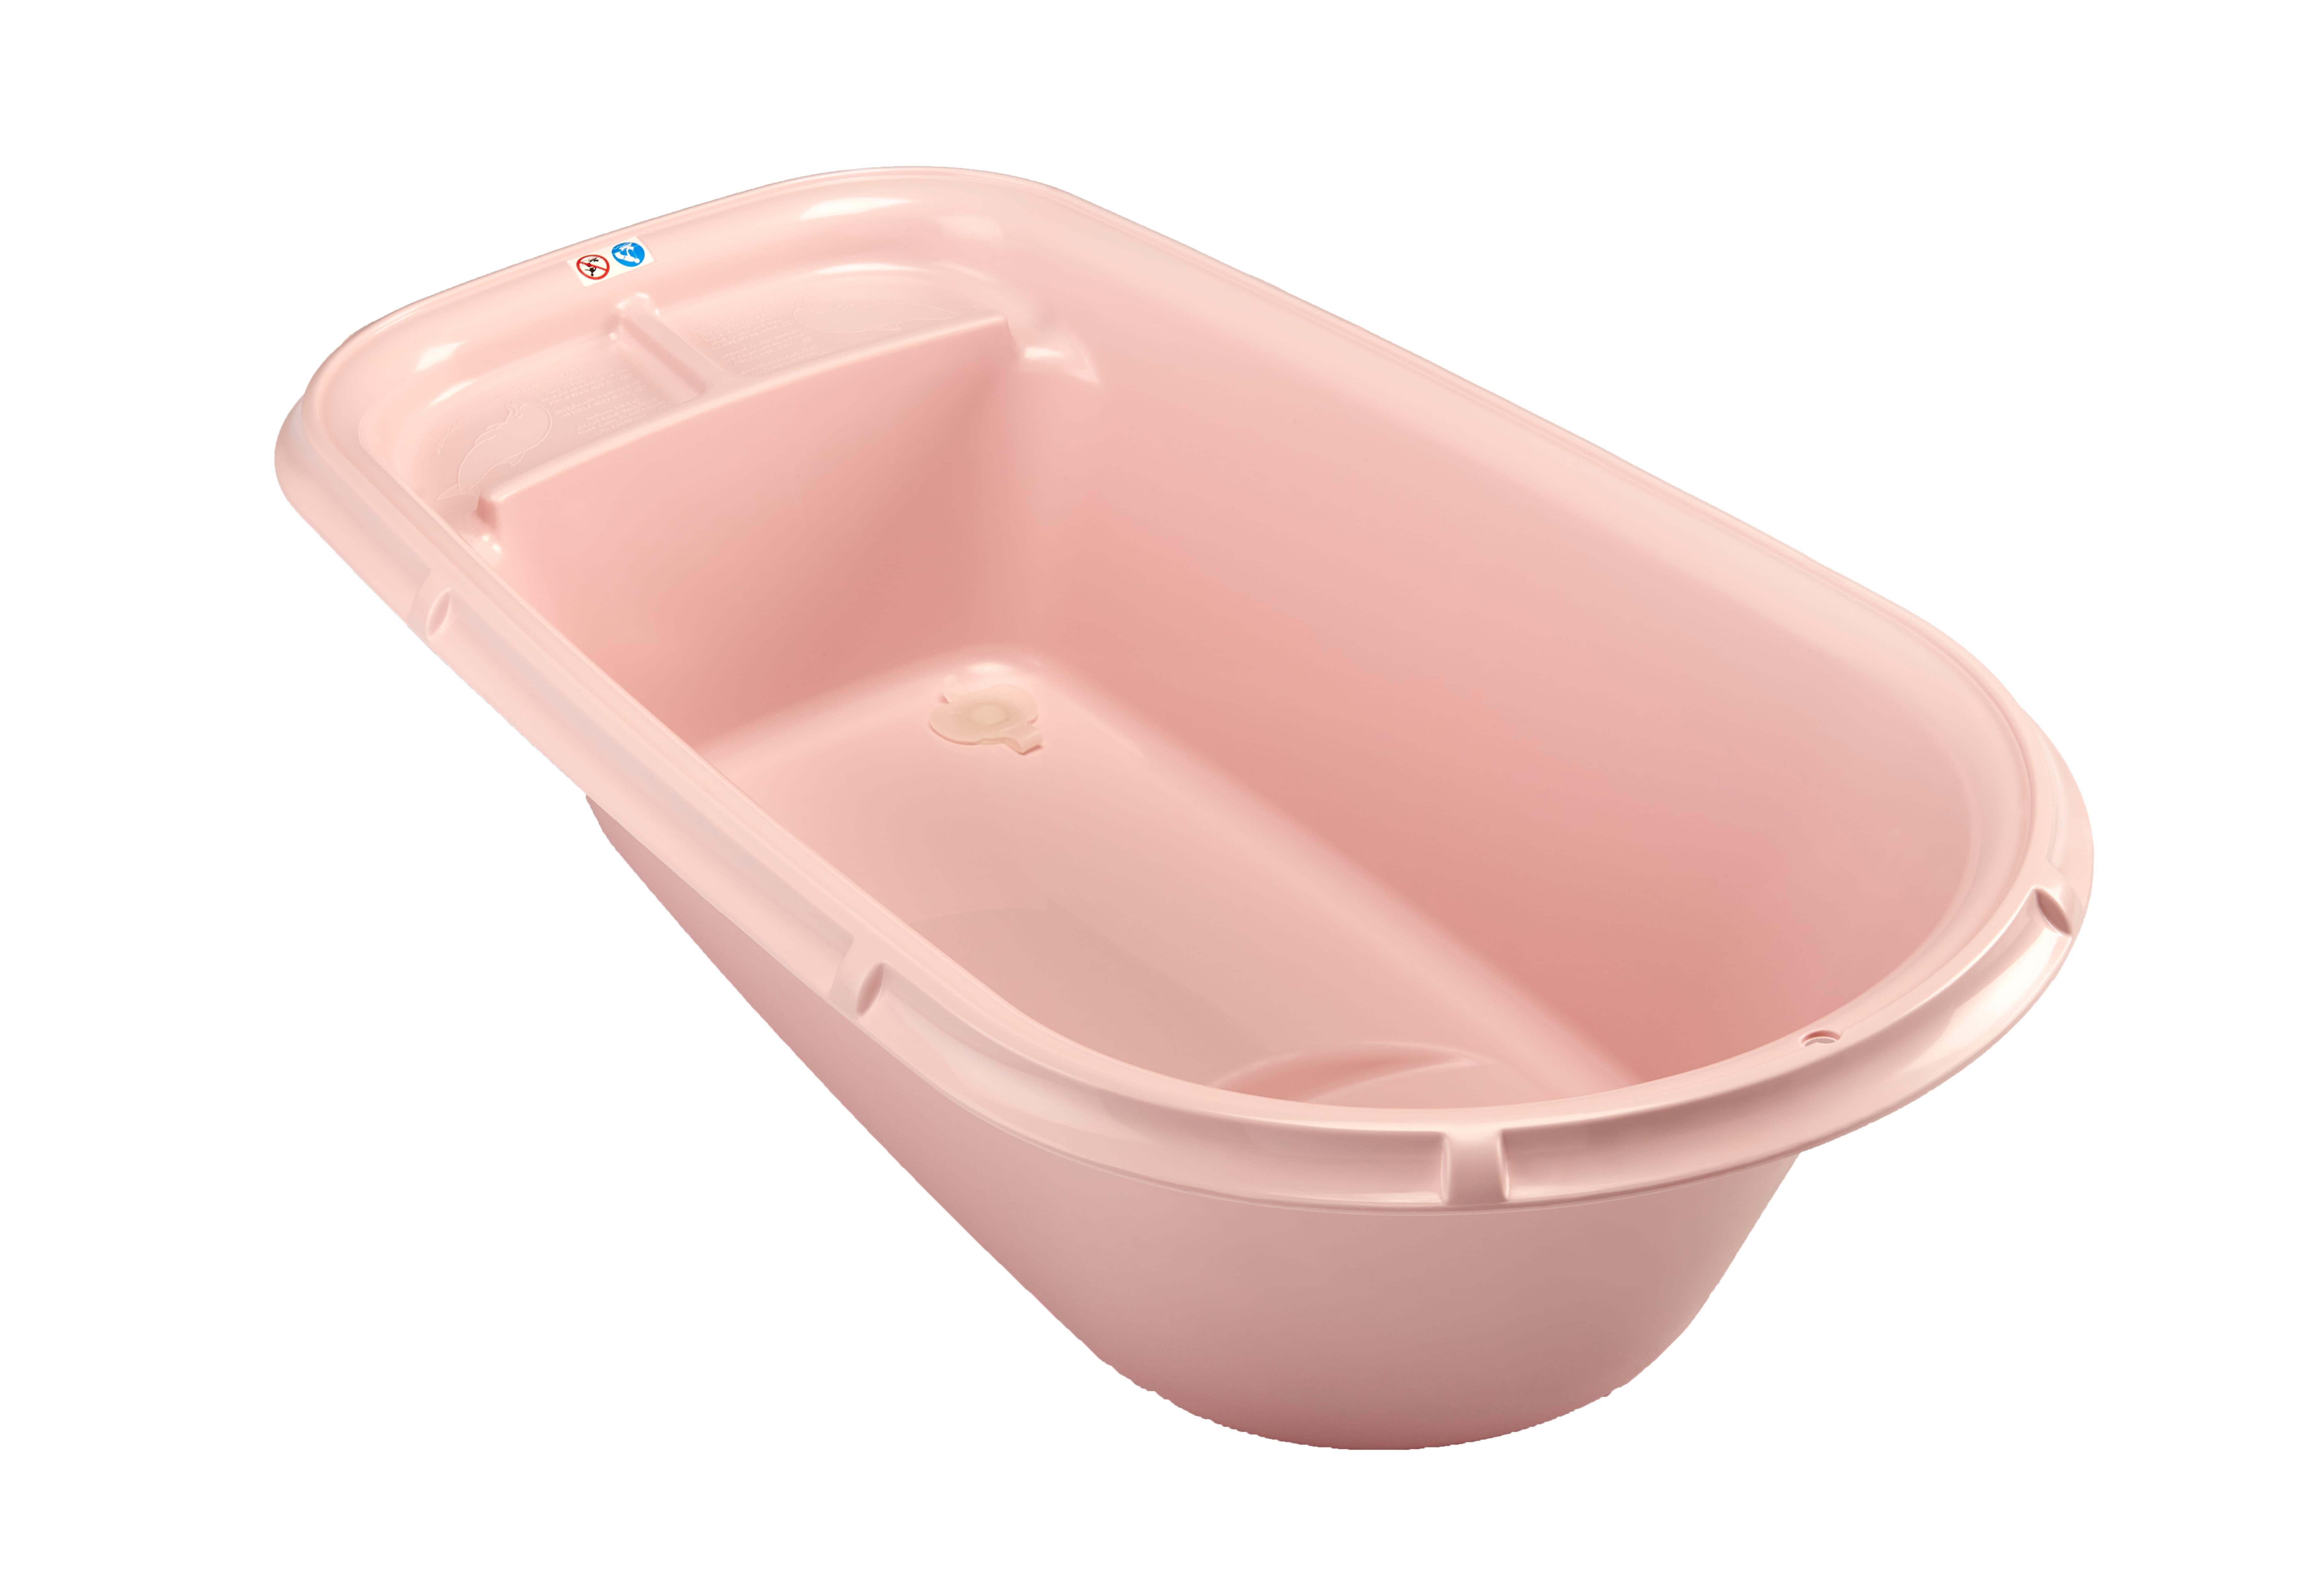 Dětská vanička Lagoon, Powder Pink